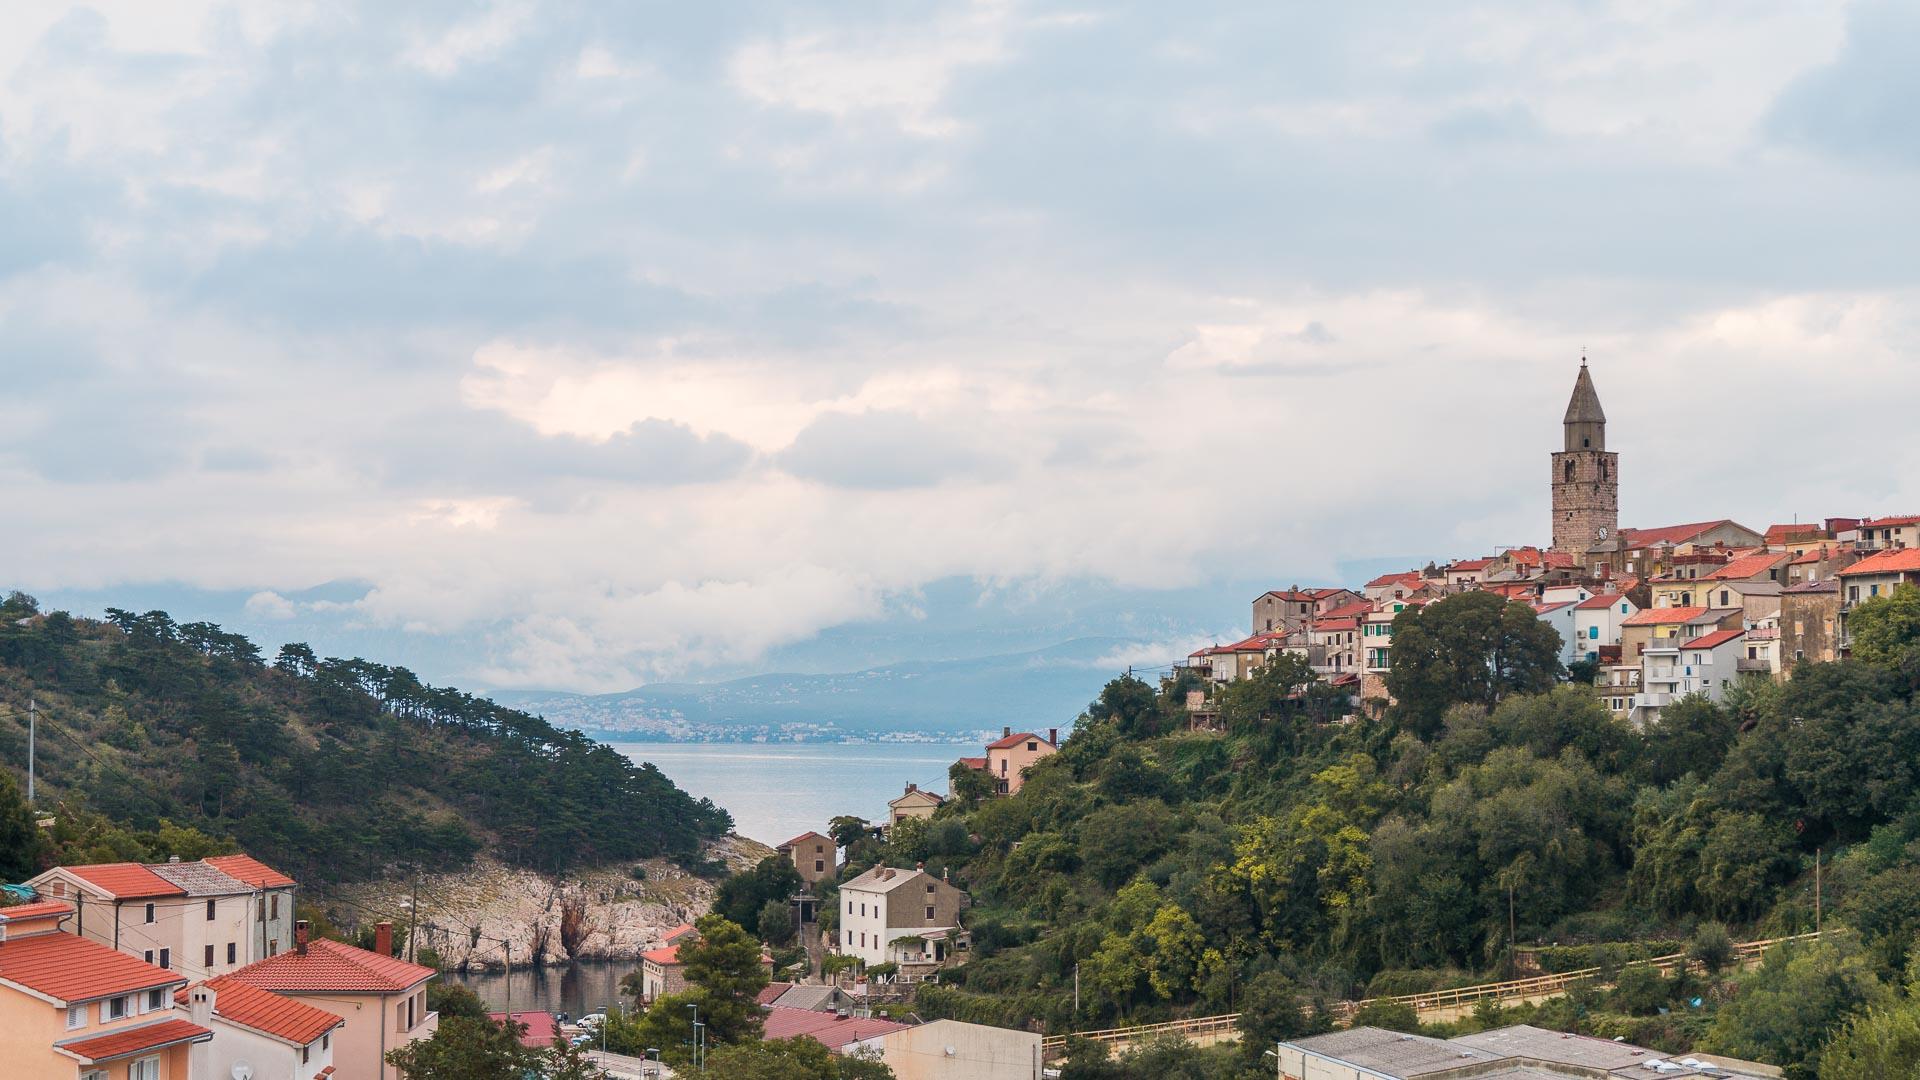 The town of Vrbnik, Krk Island, Croatia